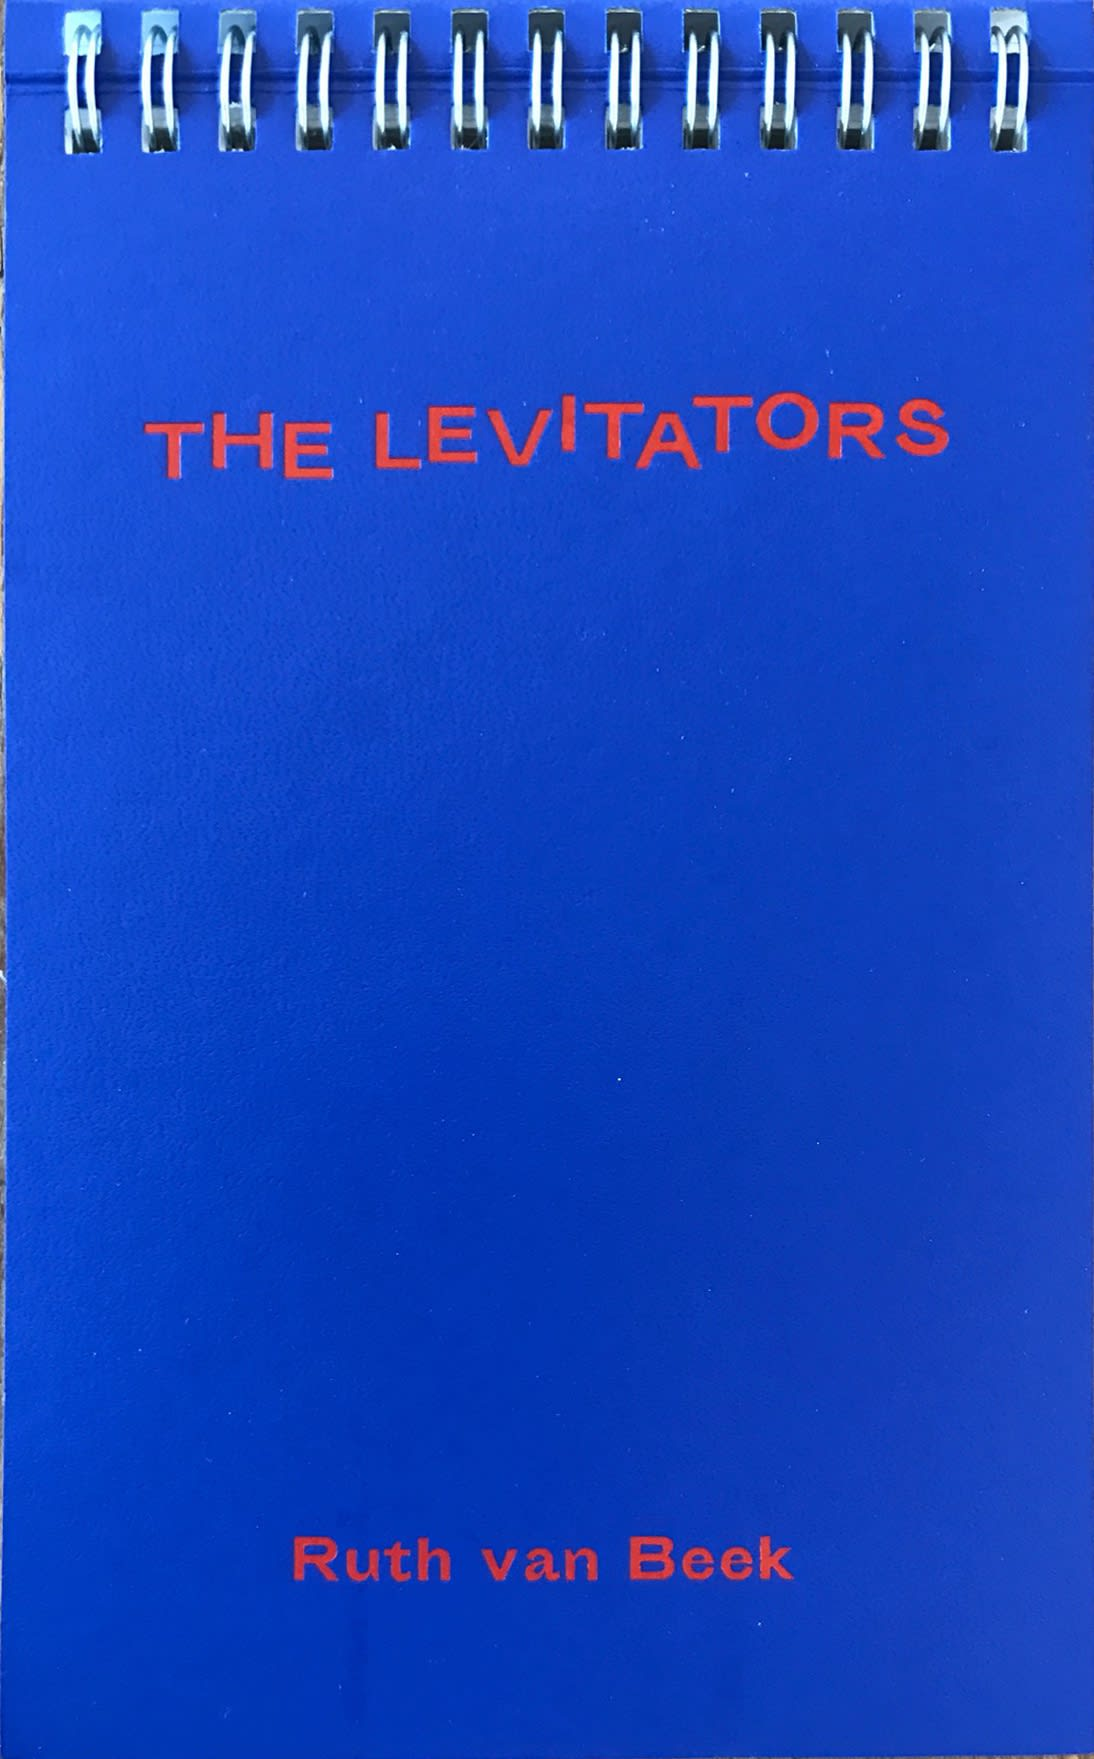 'The Levitators'